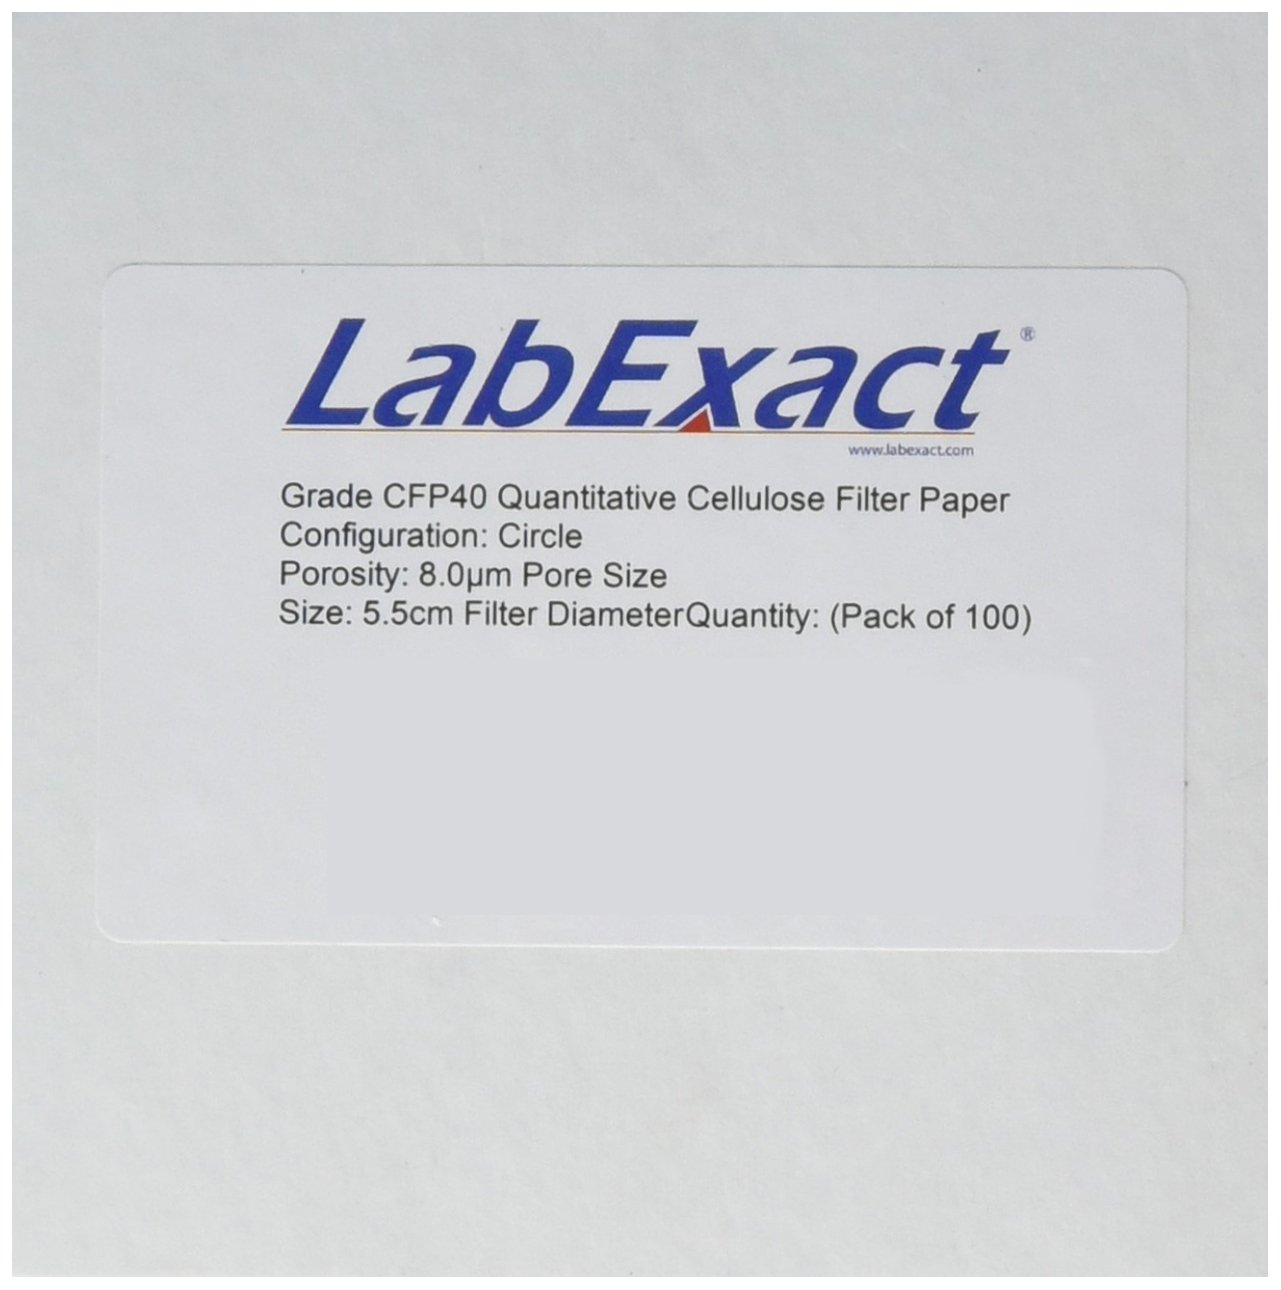 LabExact 1200249Grade Bombing free shipping CFP40 Quantitative Cellulose Filter 55% OFF Paper